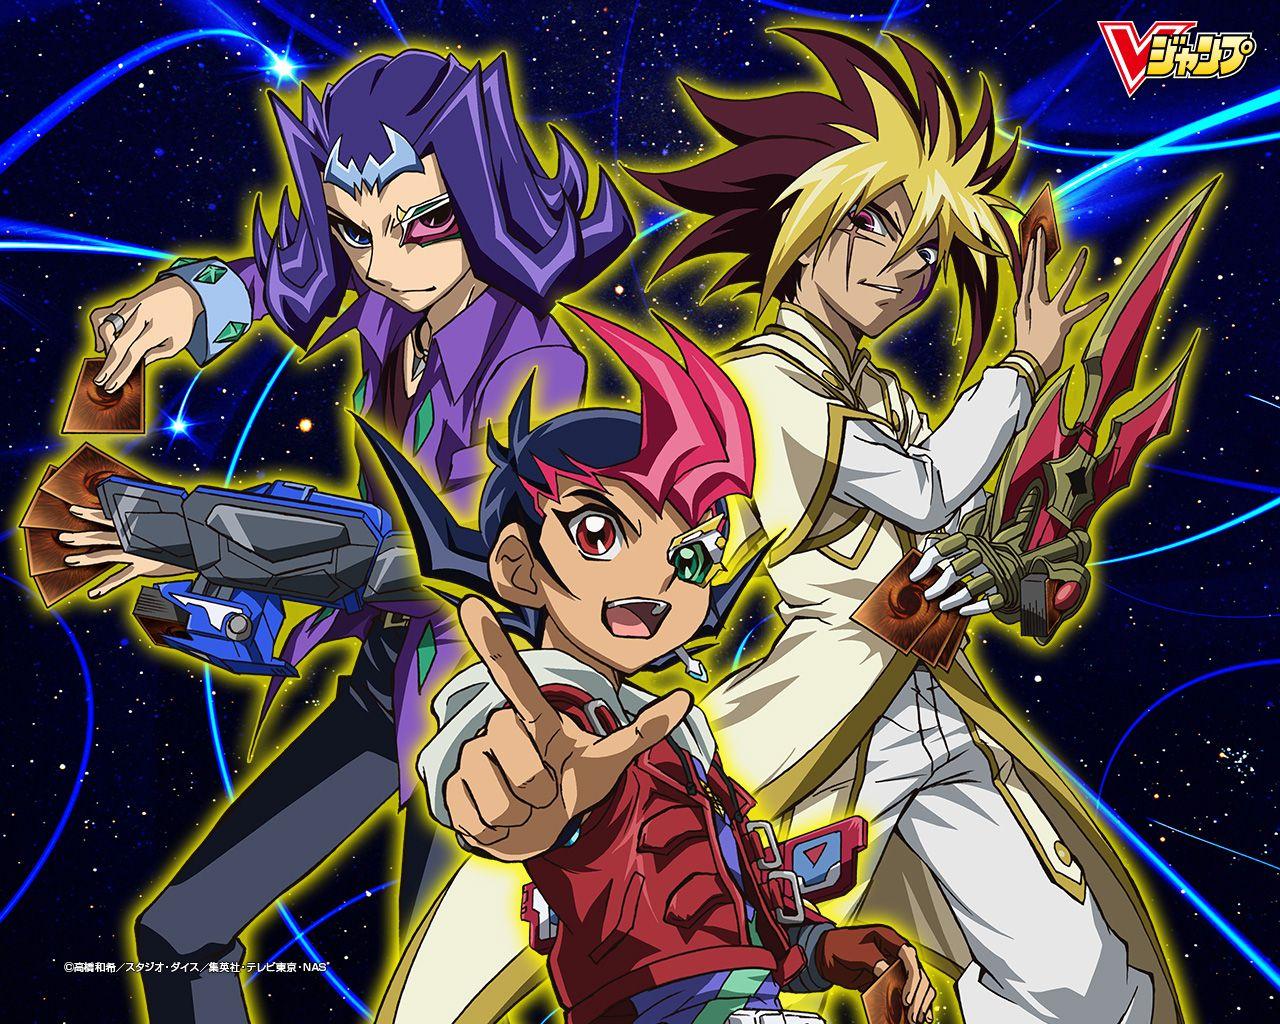 IV (YuGiOh! ZEXAL), Wallpaper Zerochan Anime Image